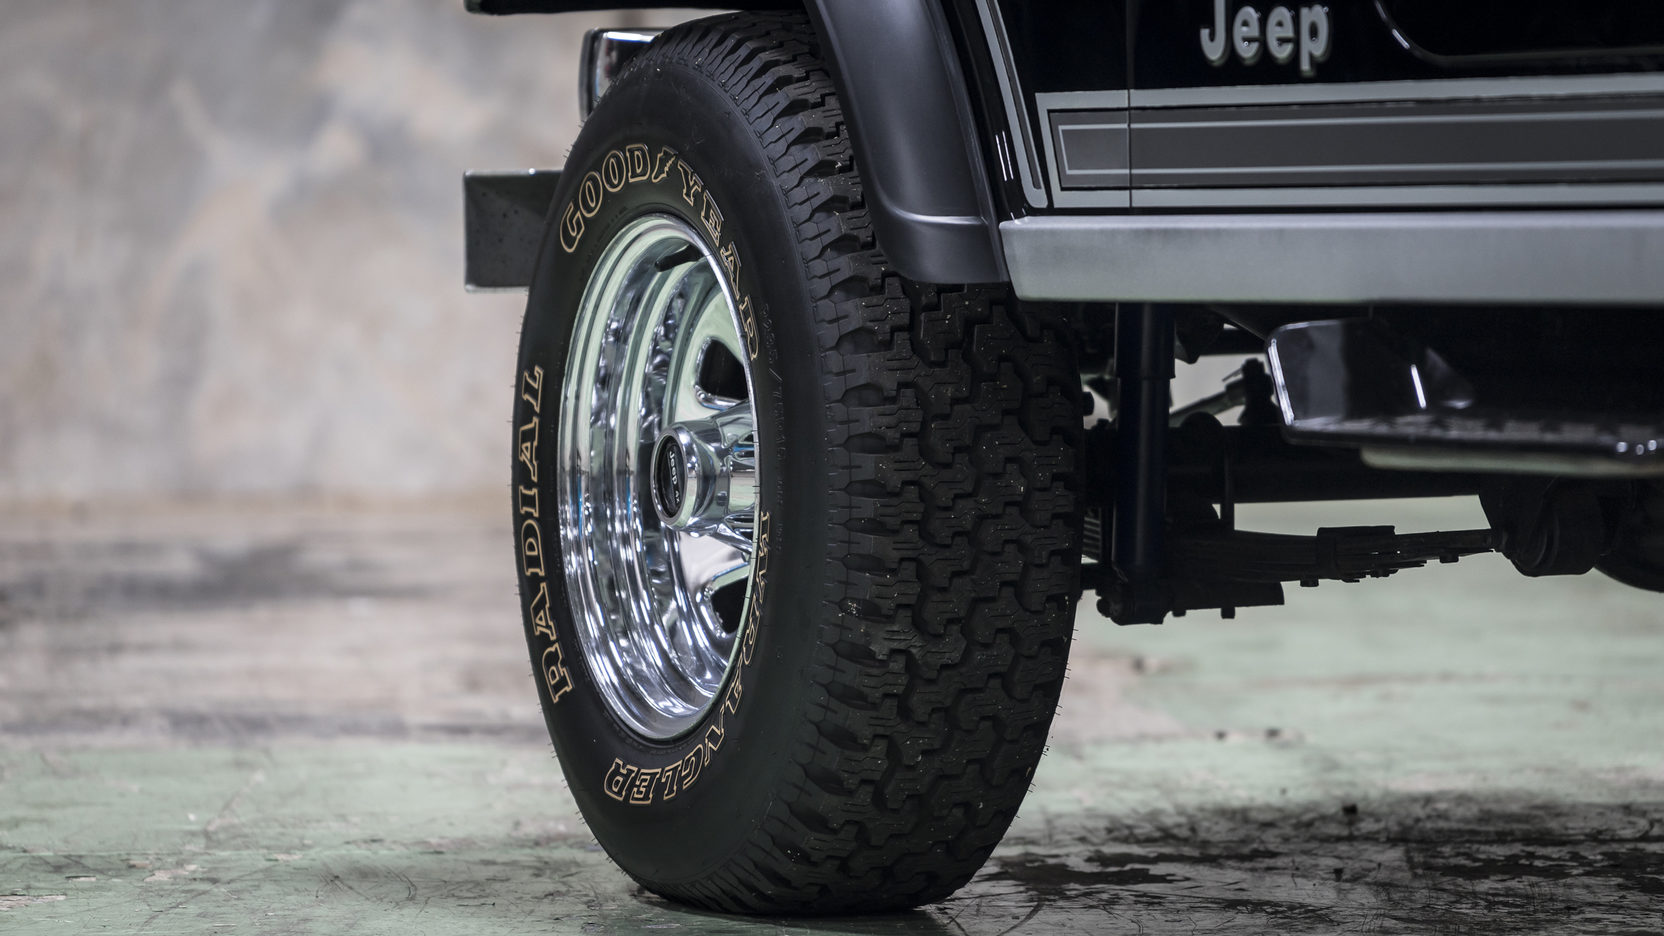 1981 Jeep CJ-7 wheel